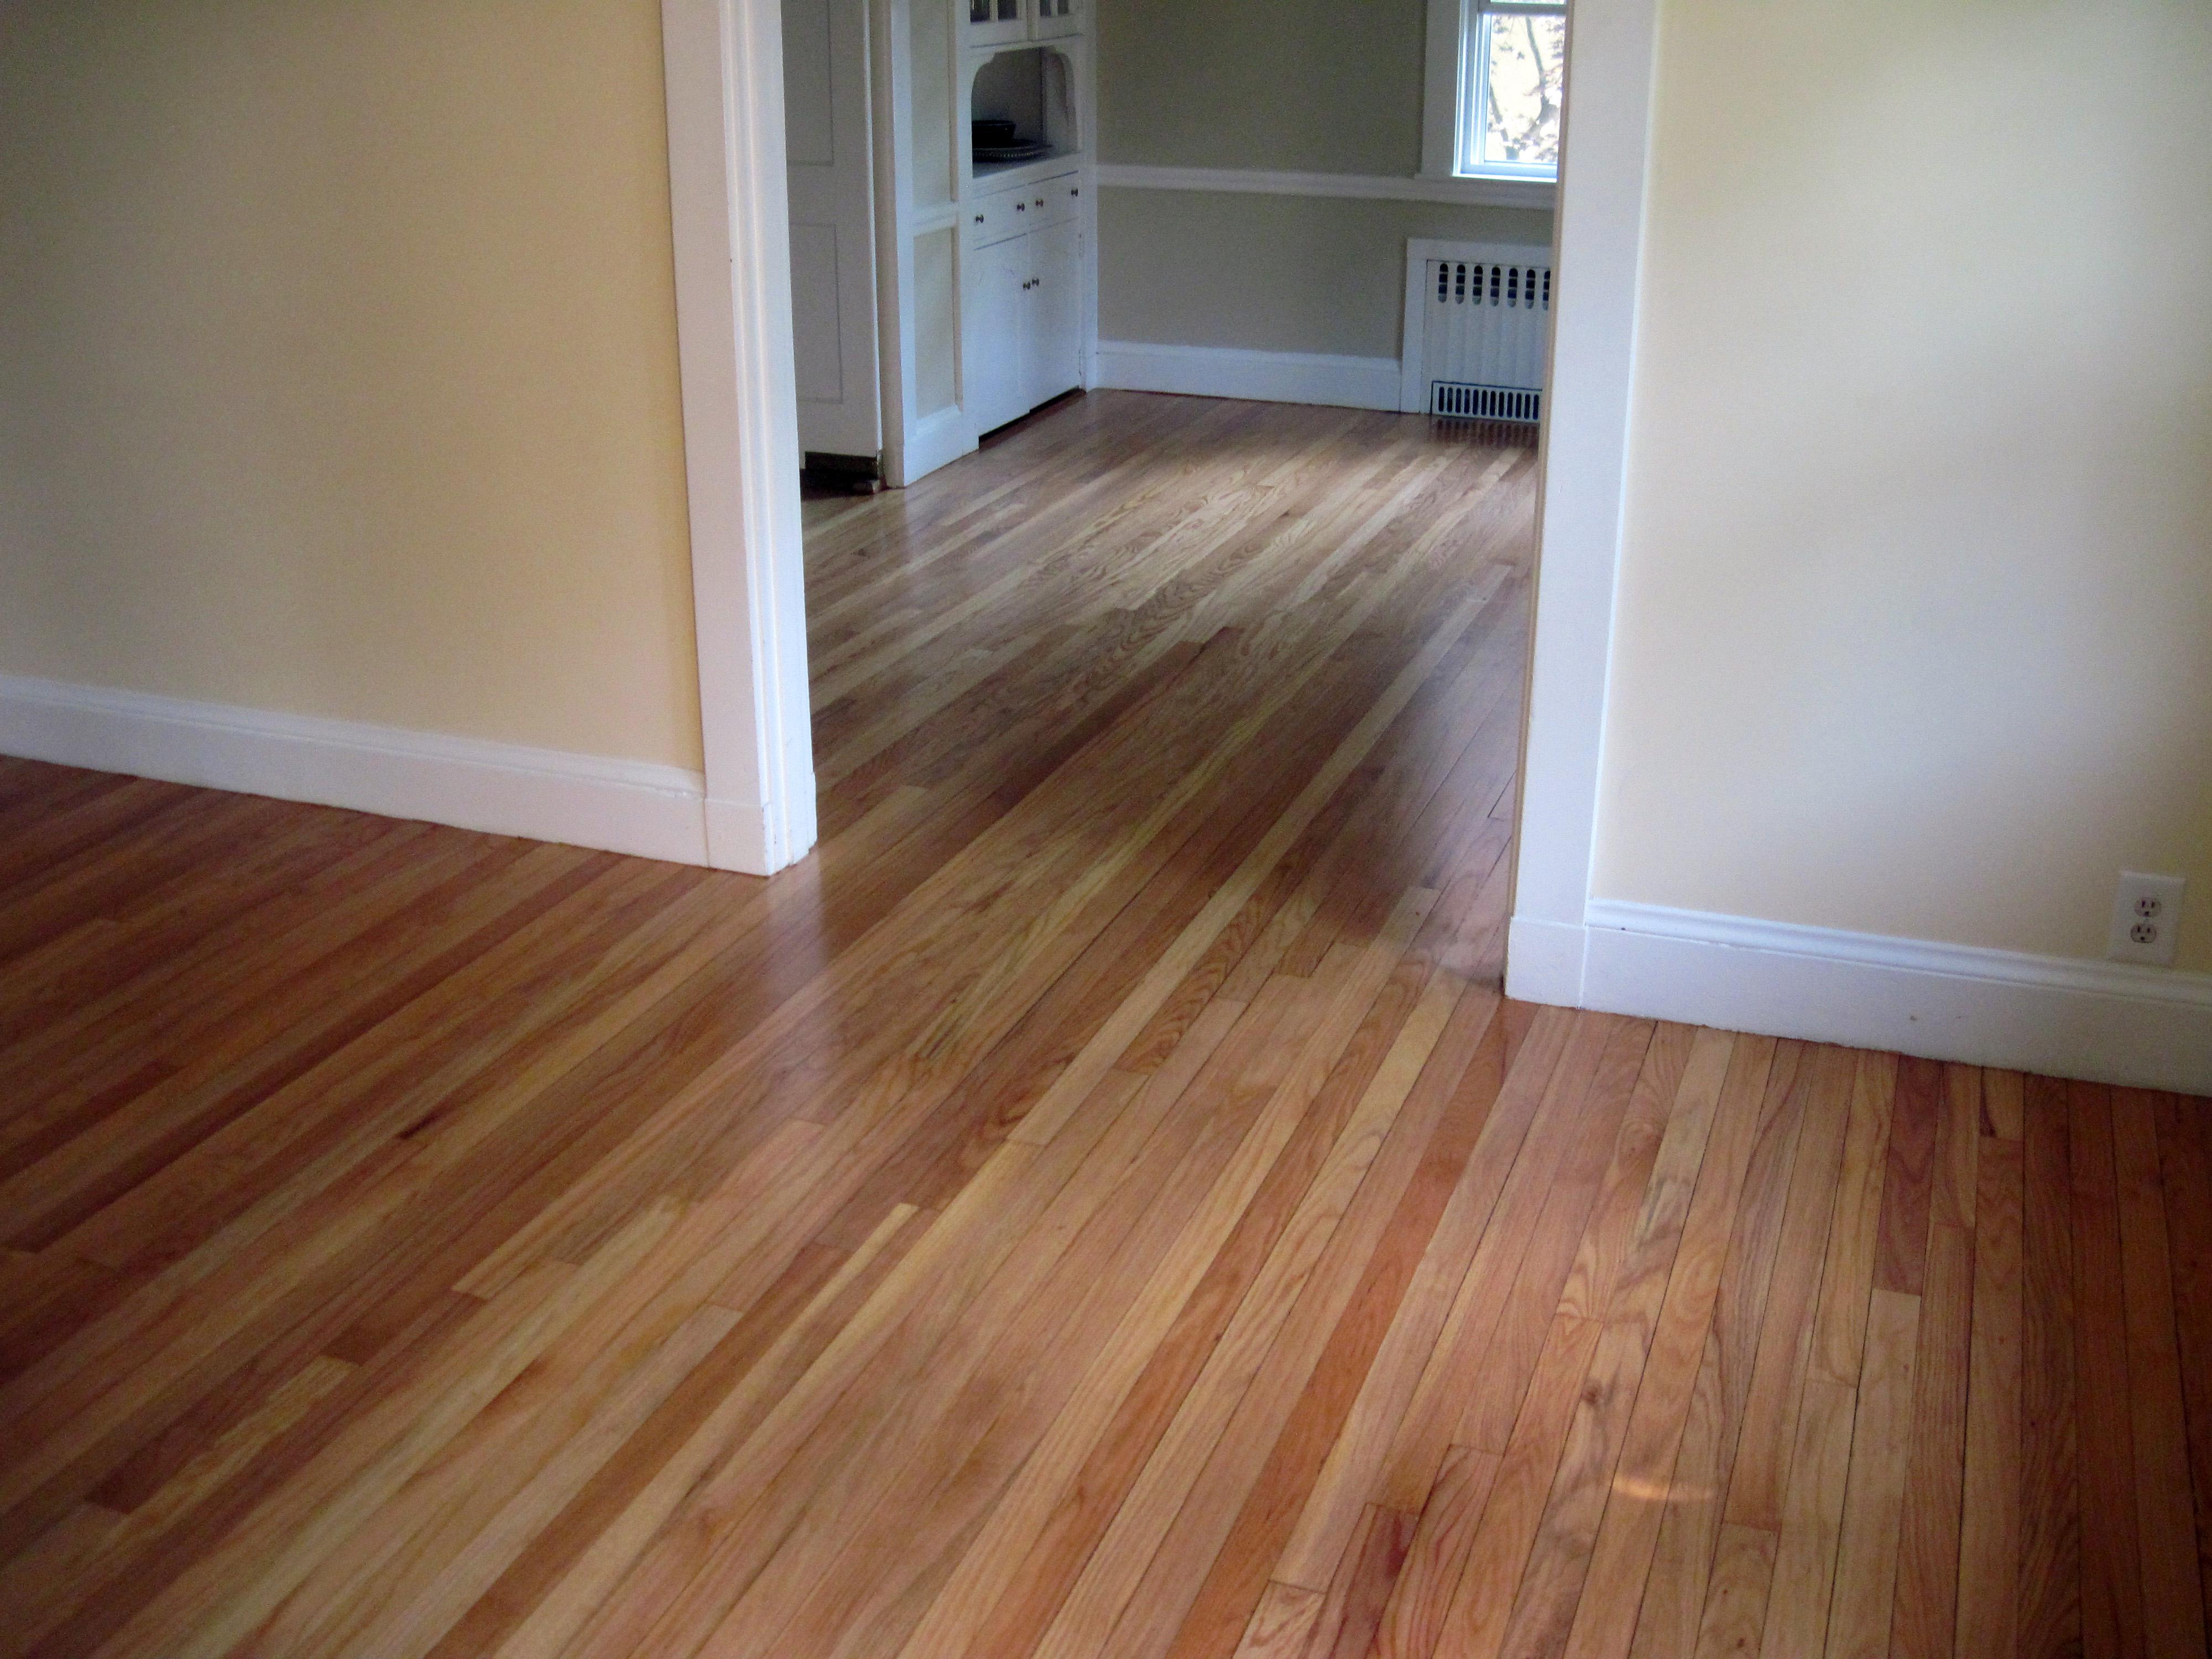 protect hardwood floors. Black Bedroom Furniture Sets. Home Design Ideas